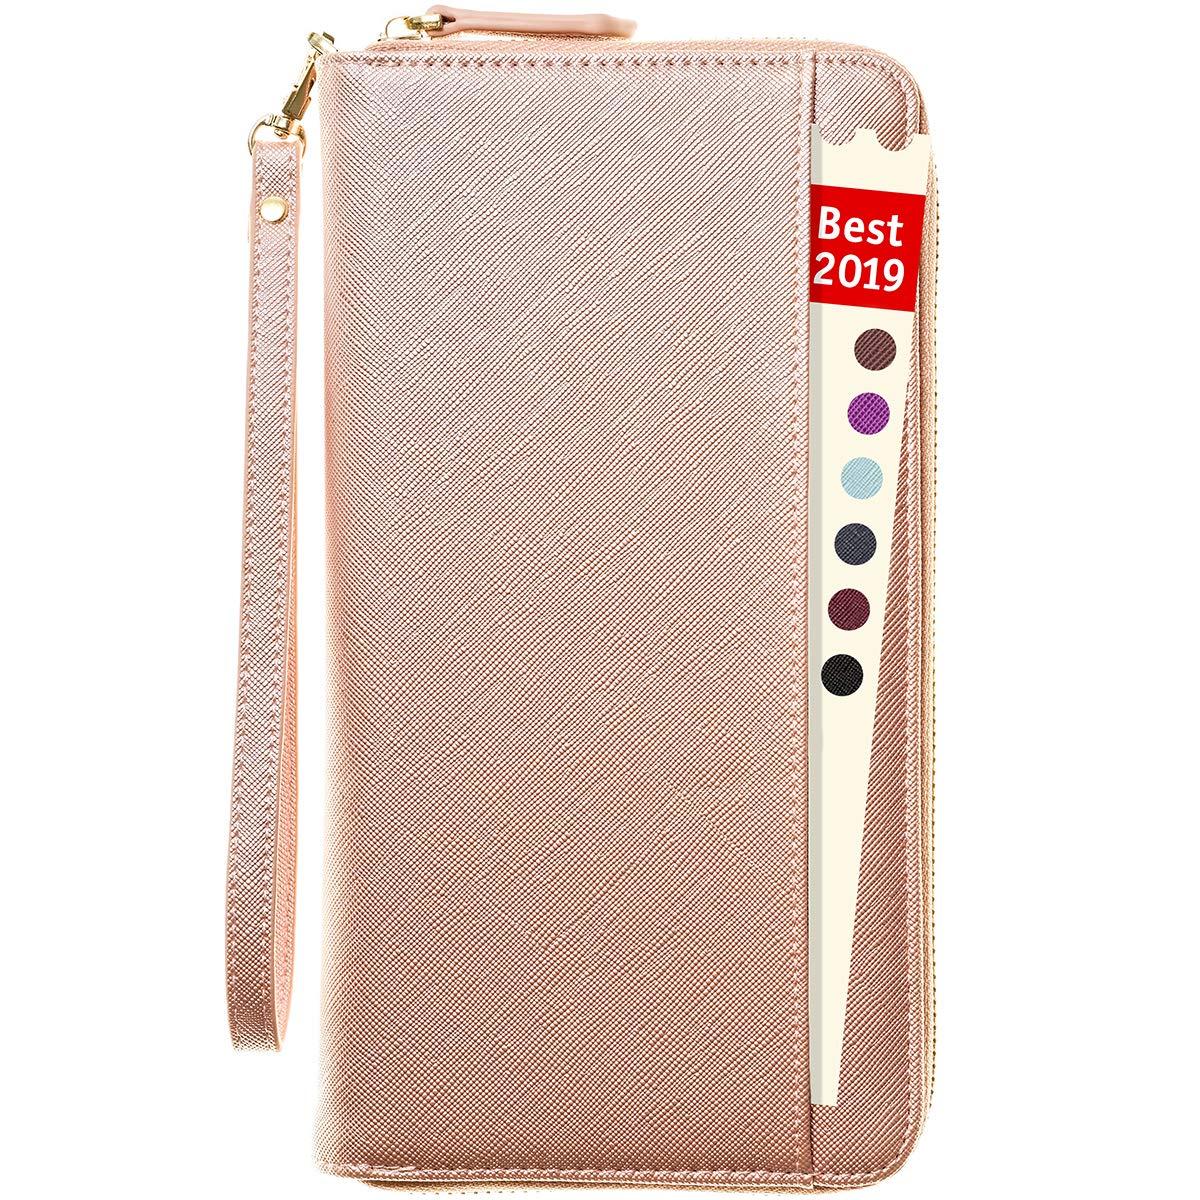 Travel Document Organizer - RFID Passport Wallet Case Family Holder Id Wristlet (Rose Gold) by Apadi